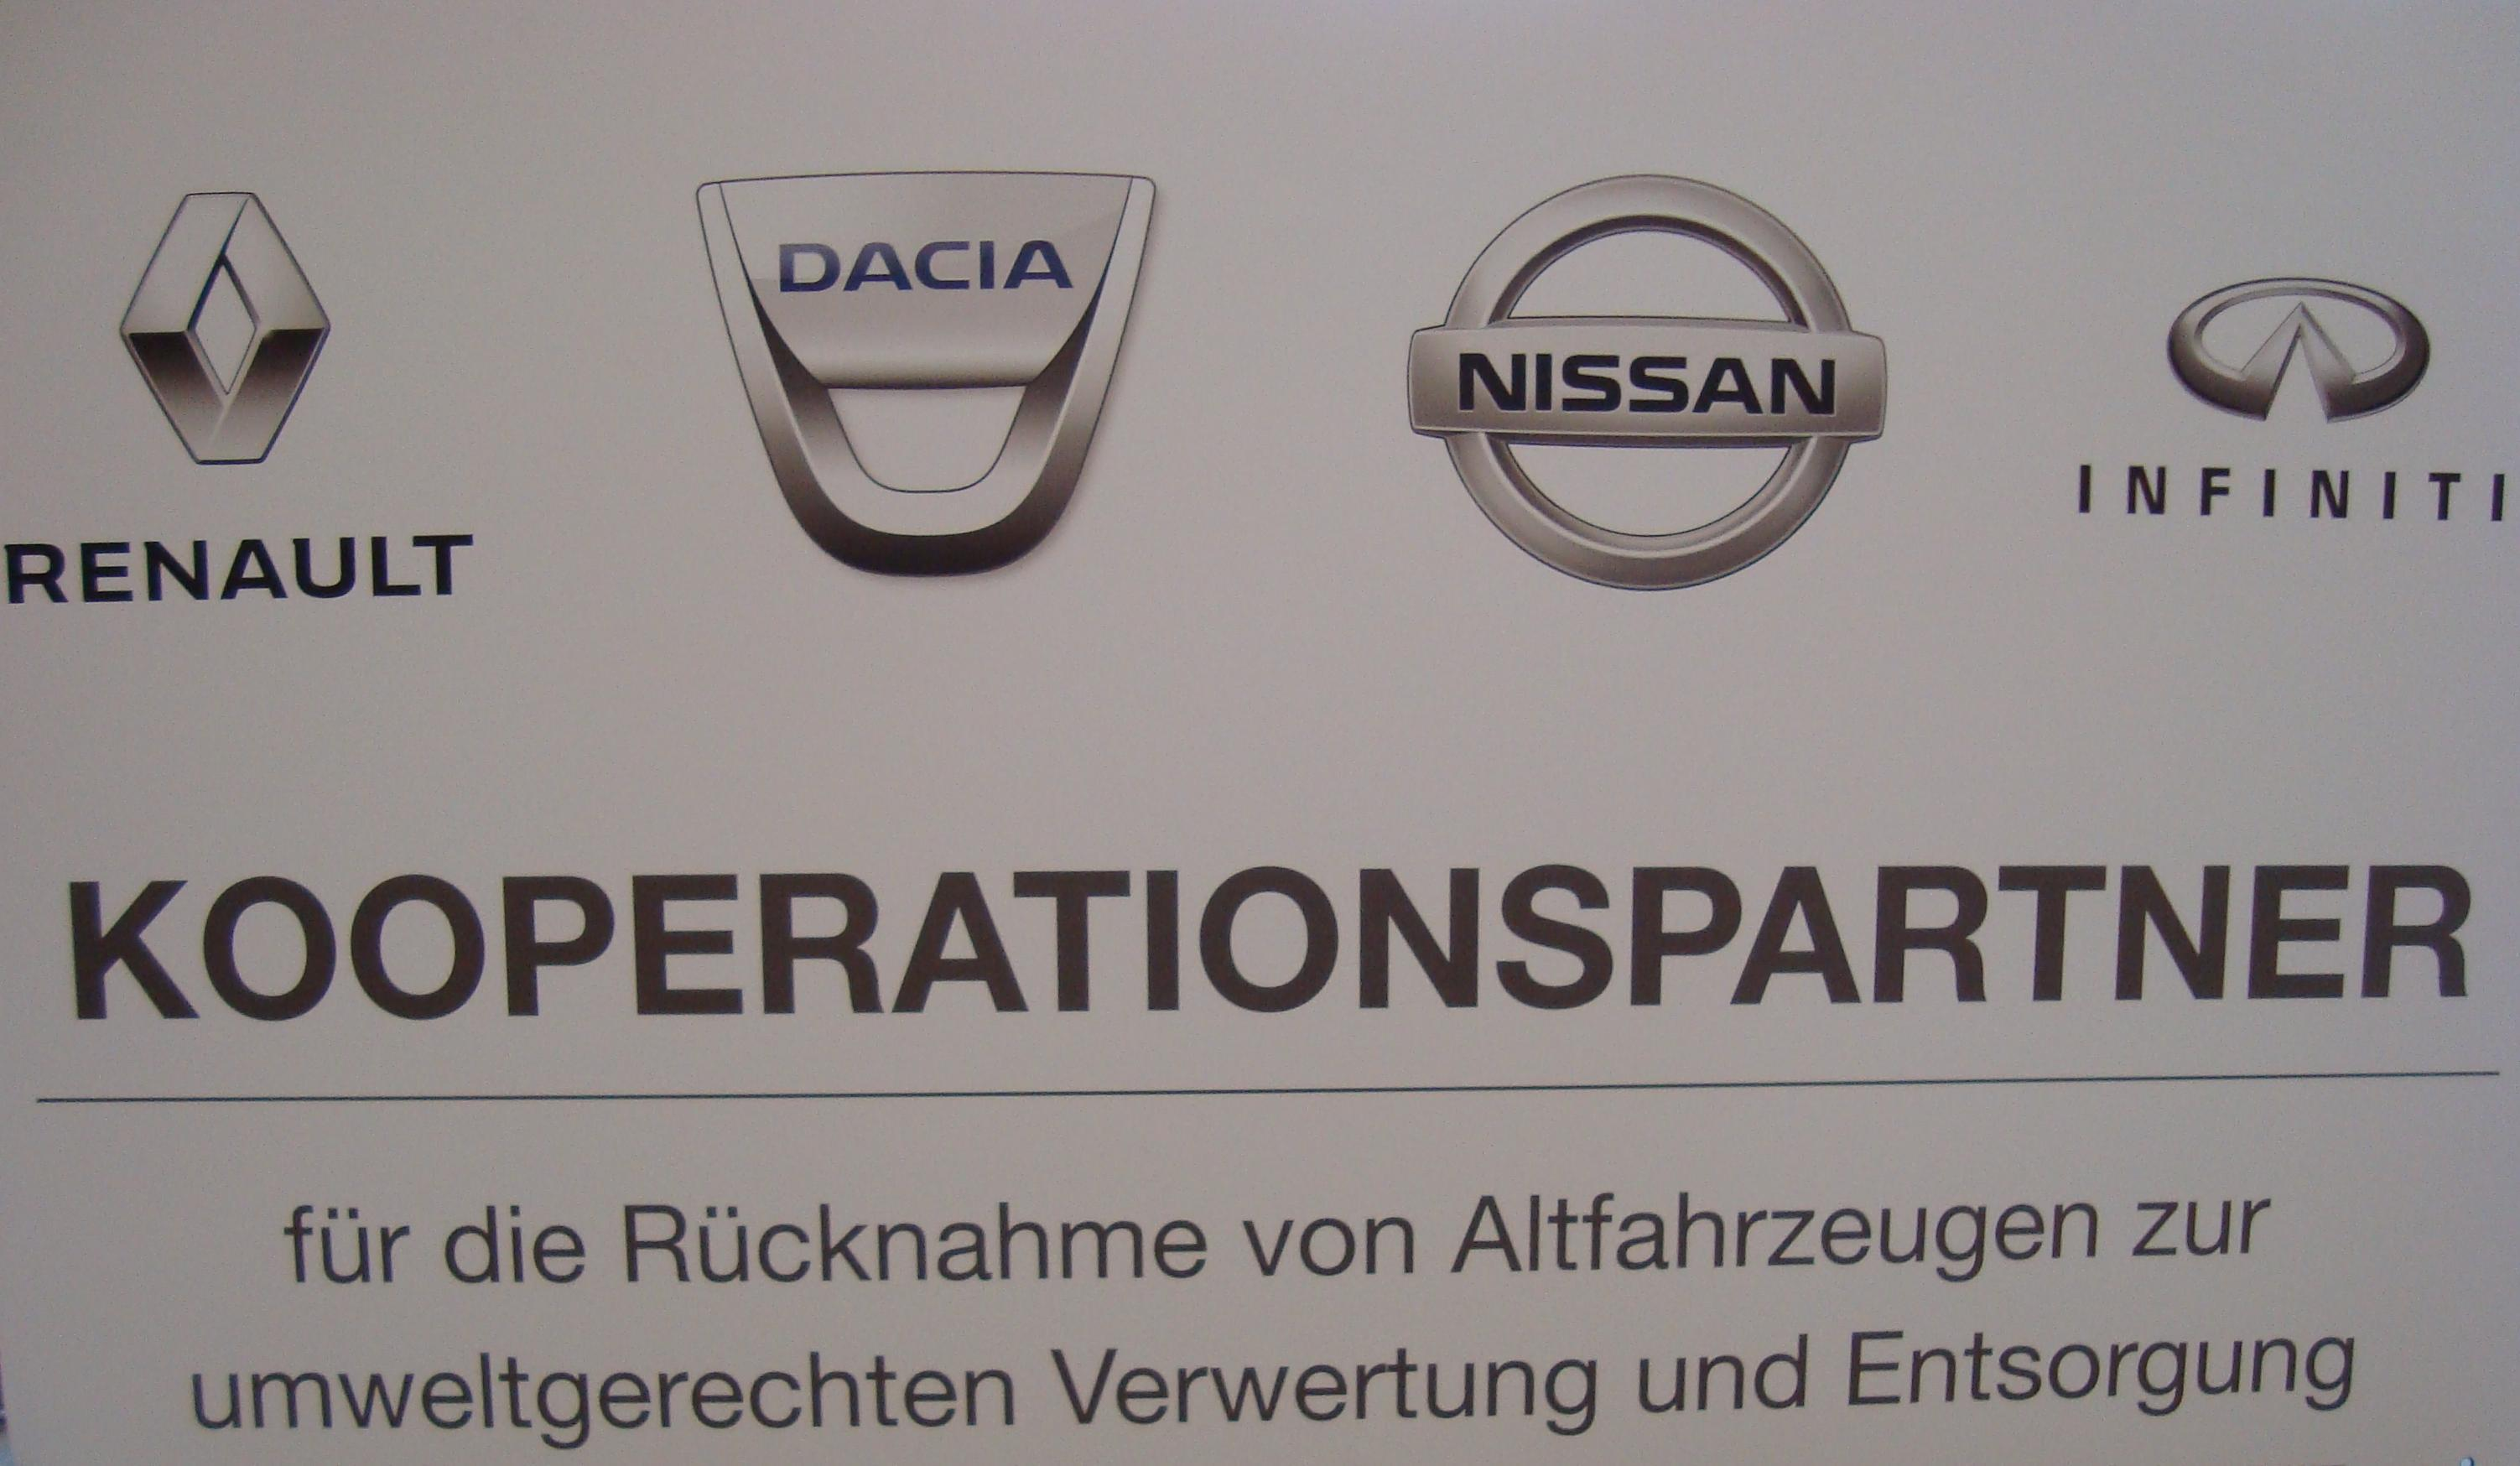 Renault Dacia Nissan Infiniti Kooperationspartner der Autoverwertung Quast